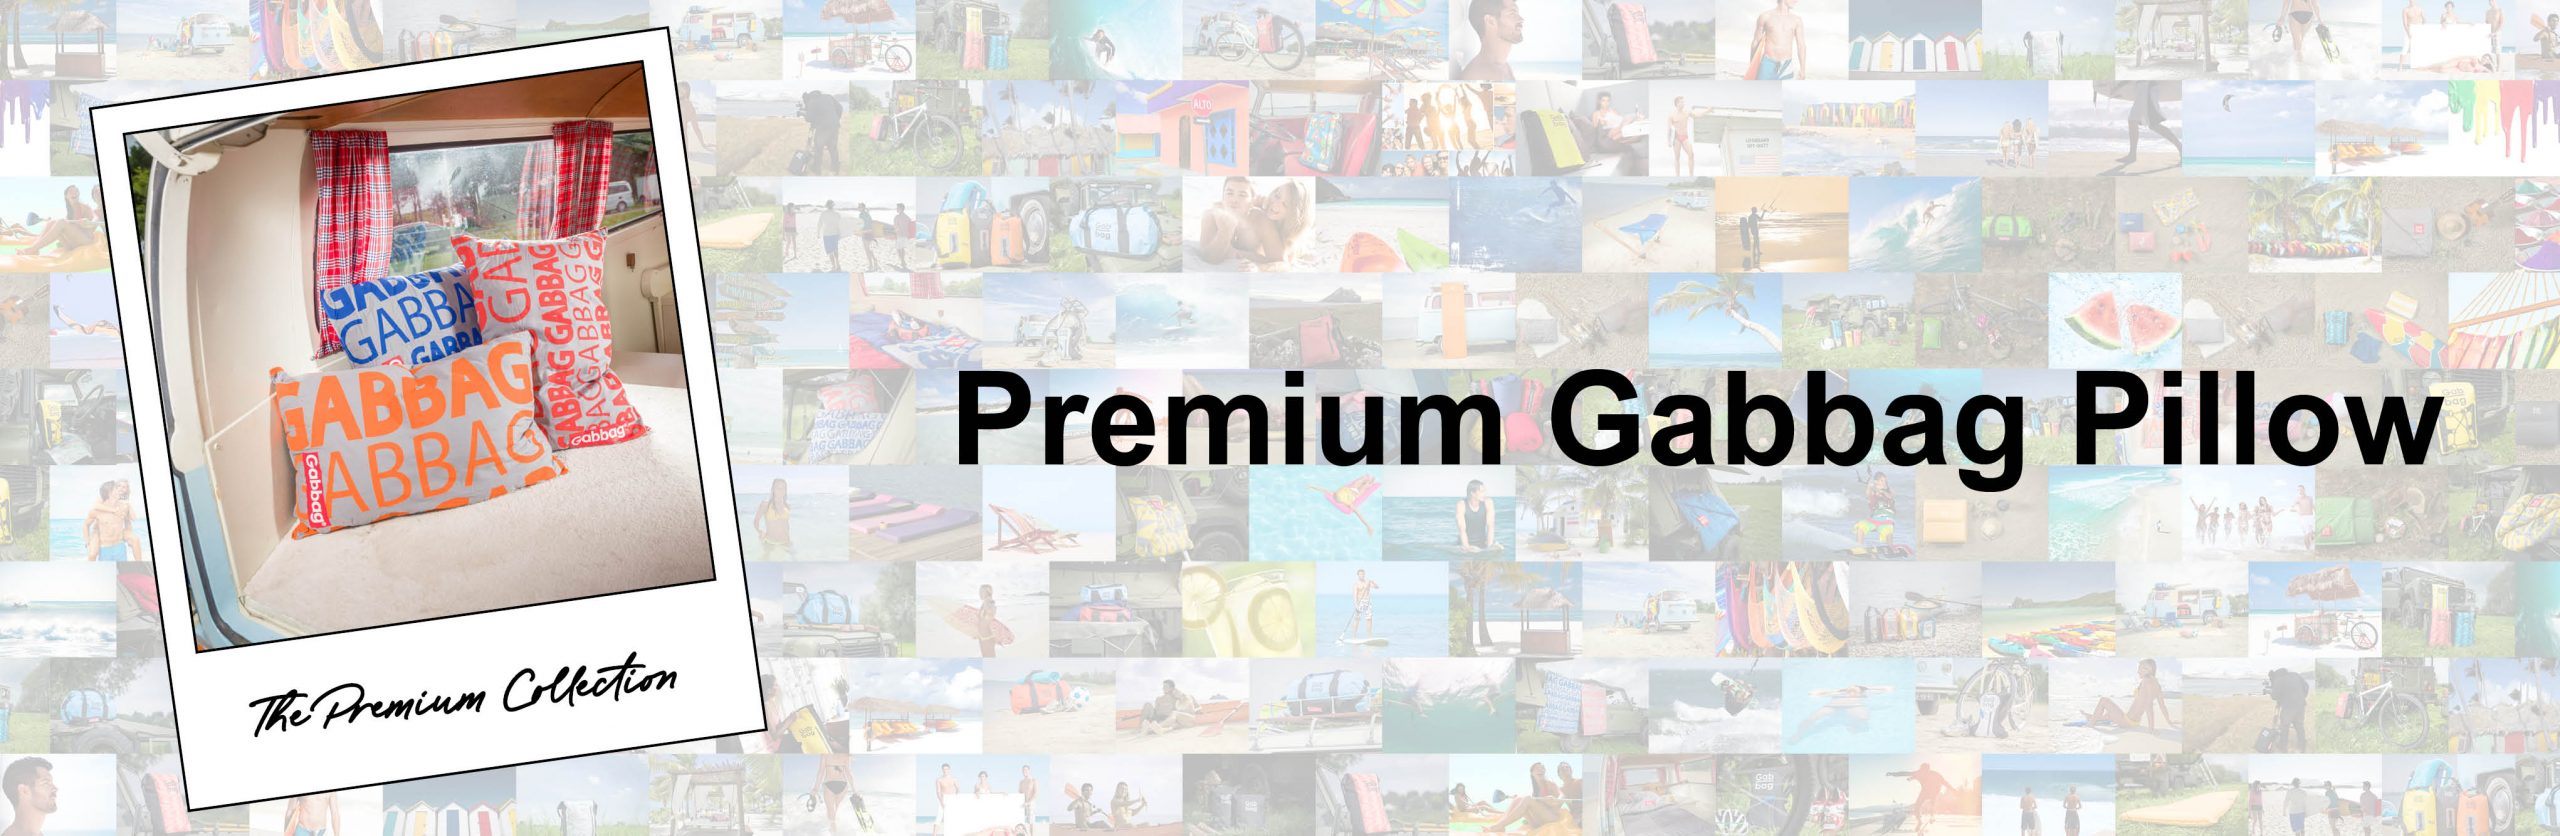 Premium Gabbag Pillow